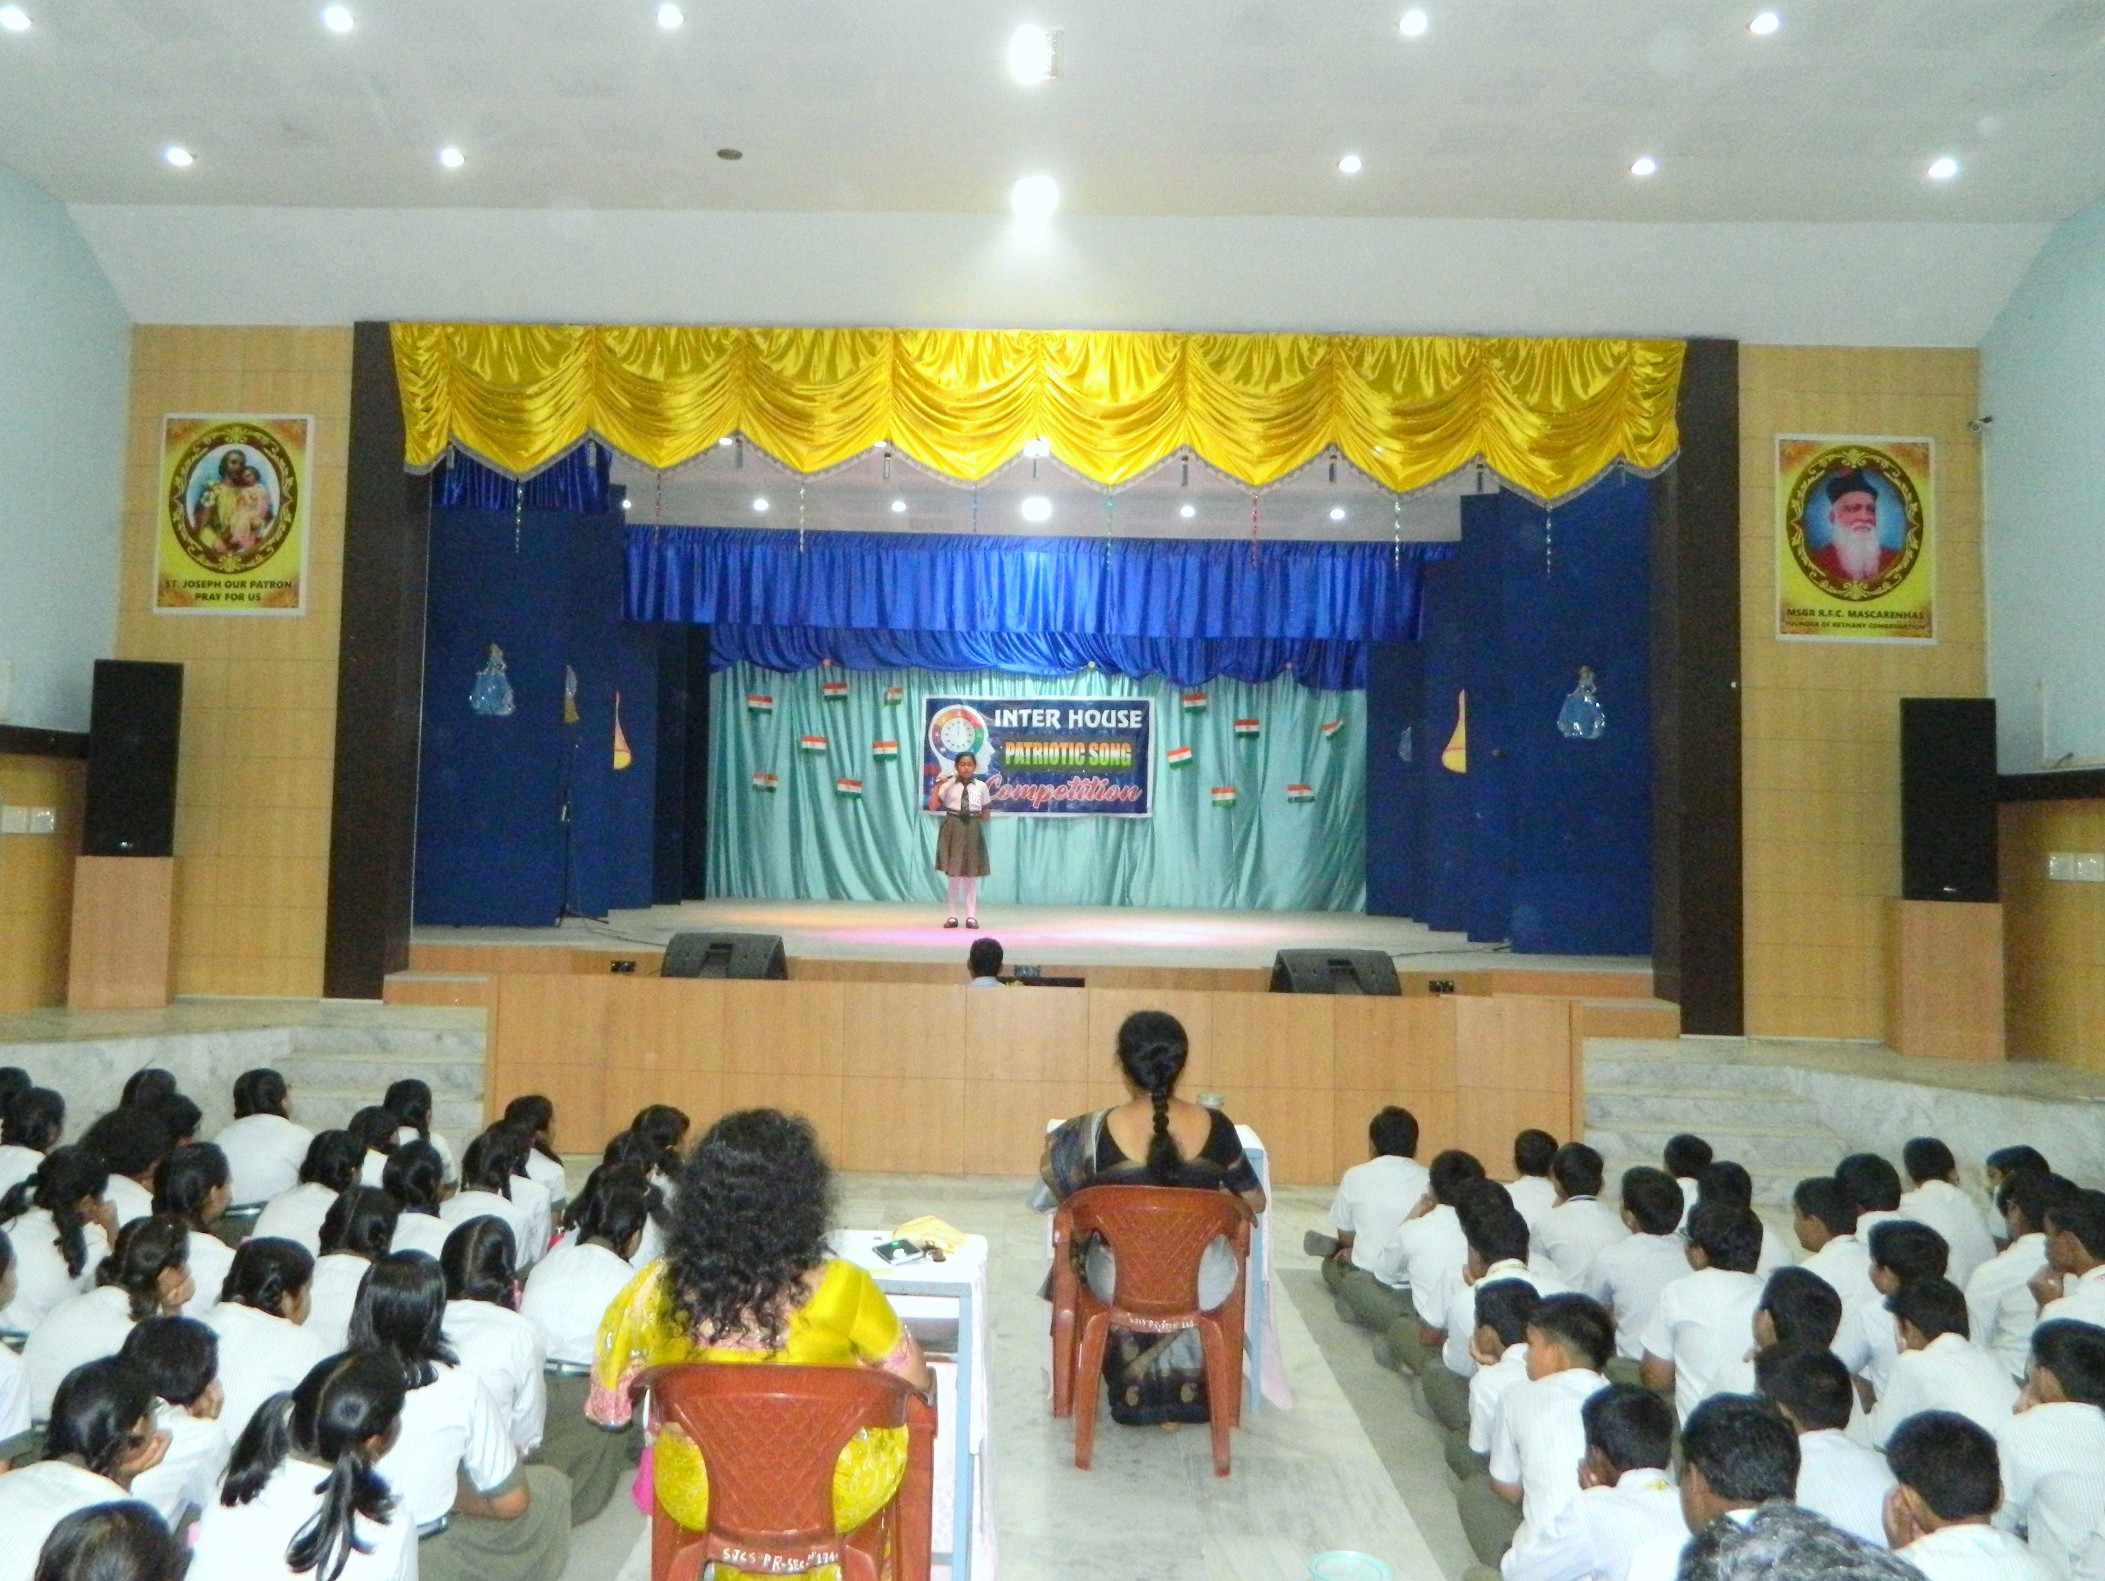 St  Joseph's Convent H S  School, Chittaranjan | Gallery